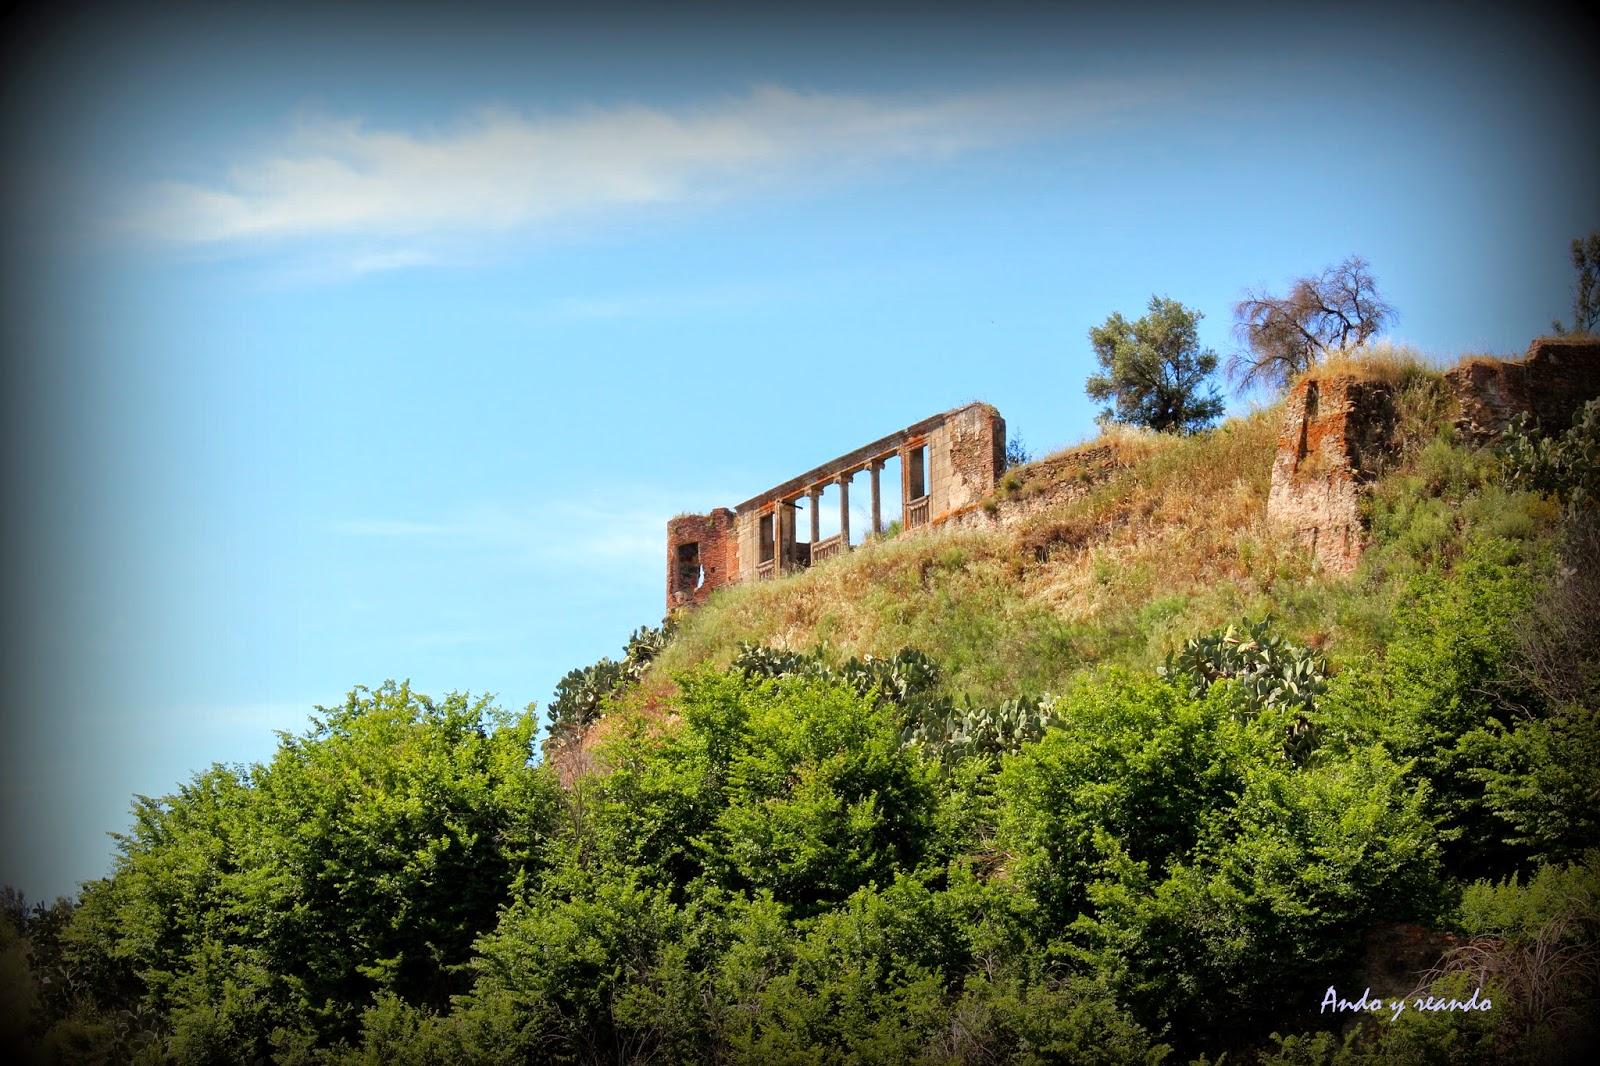 Columnas del mirador de Duques de Alba en Coria